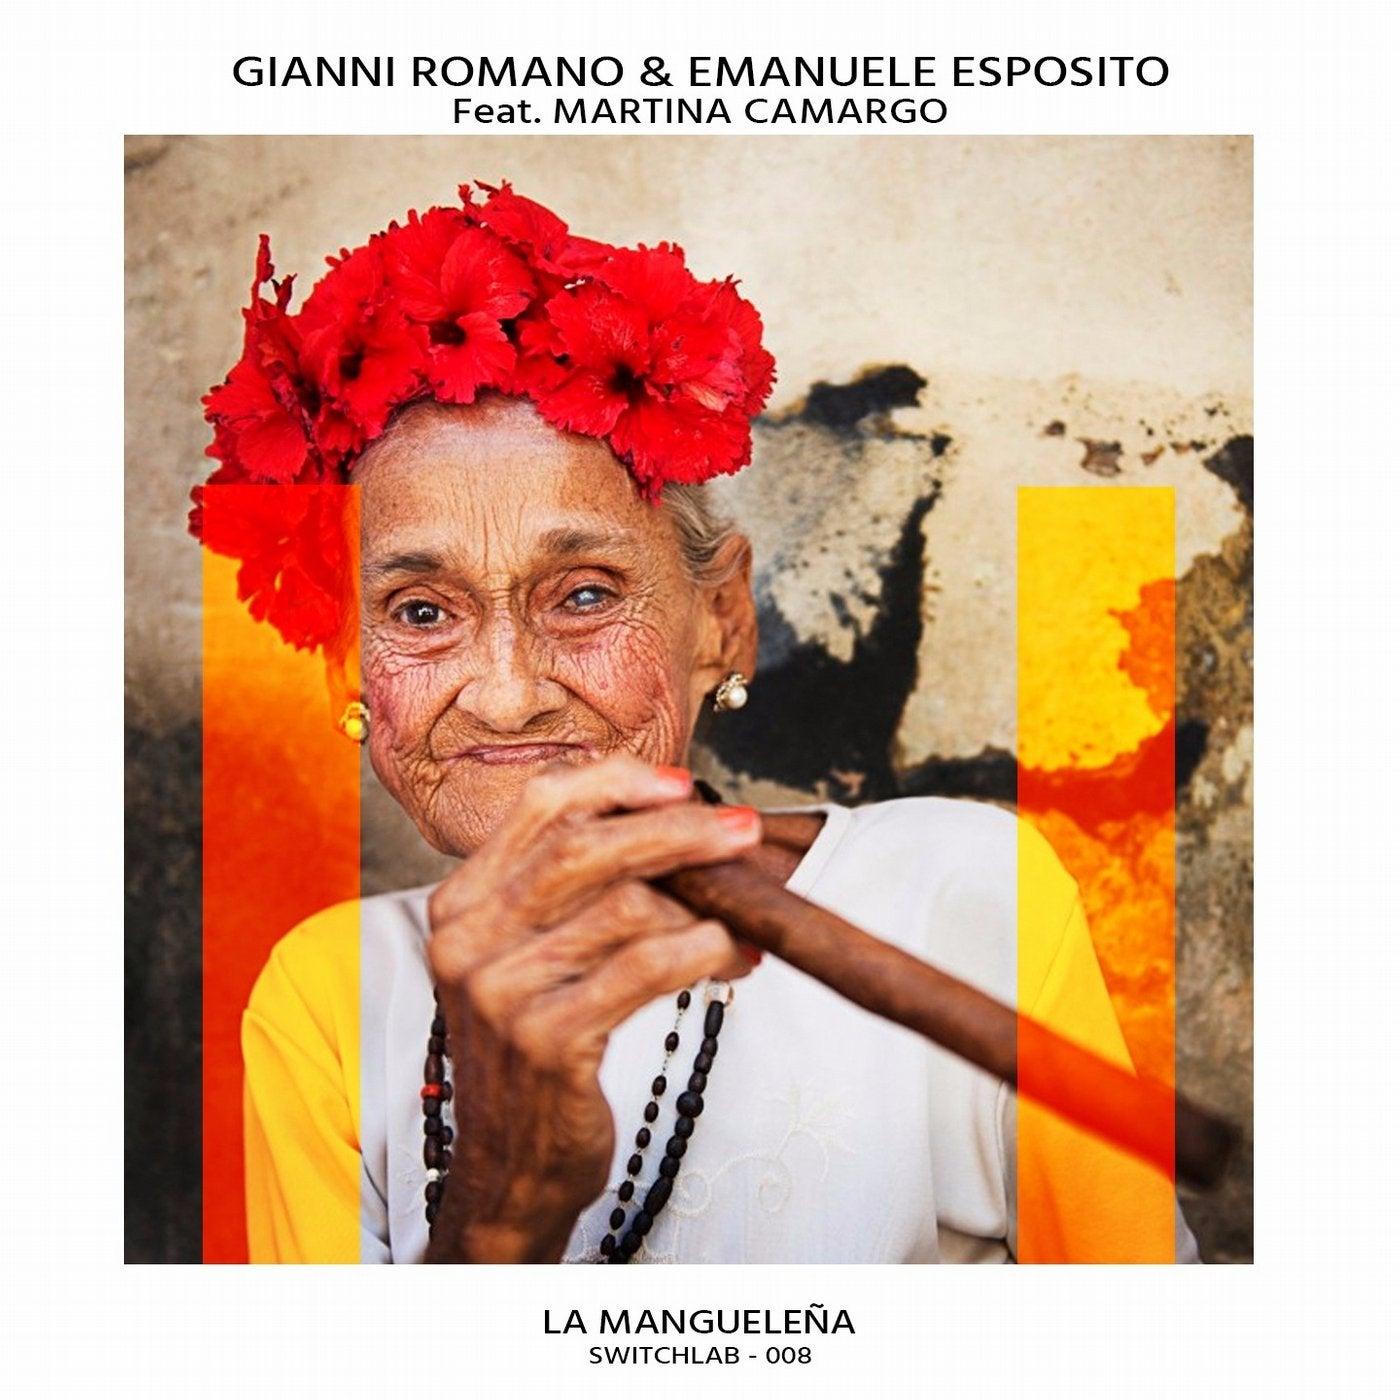 La Manguelena feat. Martina Camargo (Original Mix)